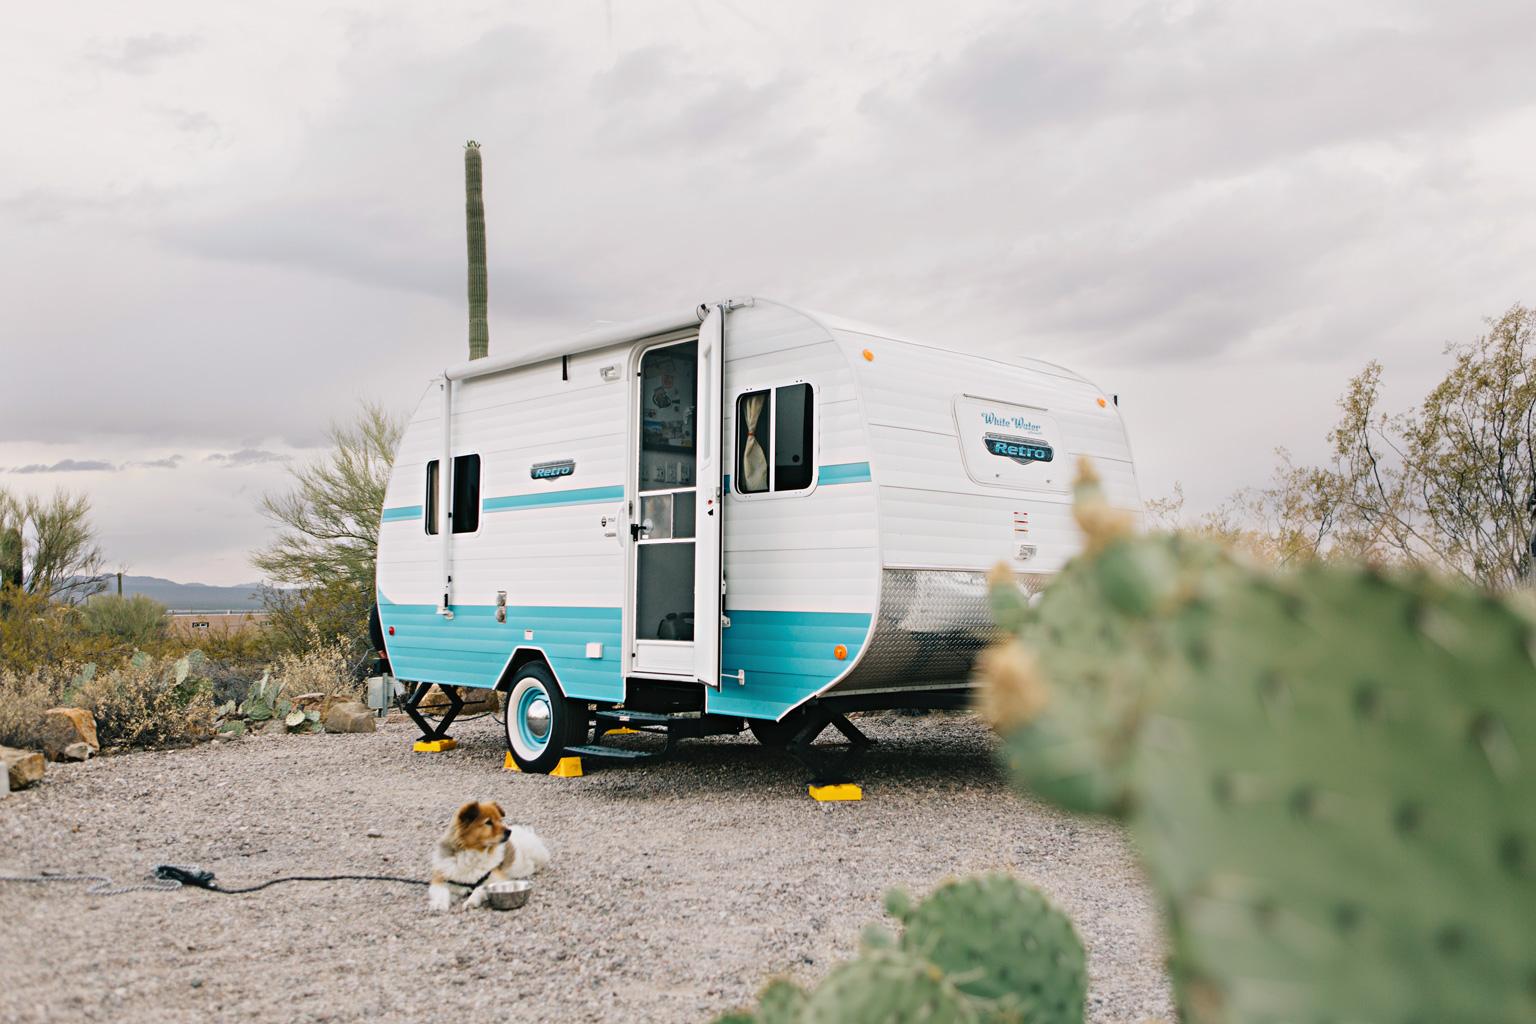 retro_camper_supplies_fulltime_rv_camperlife